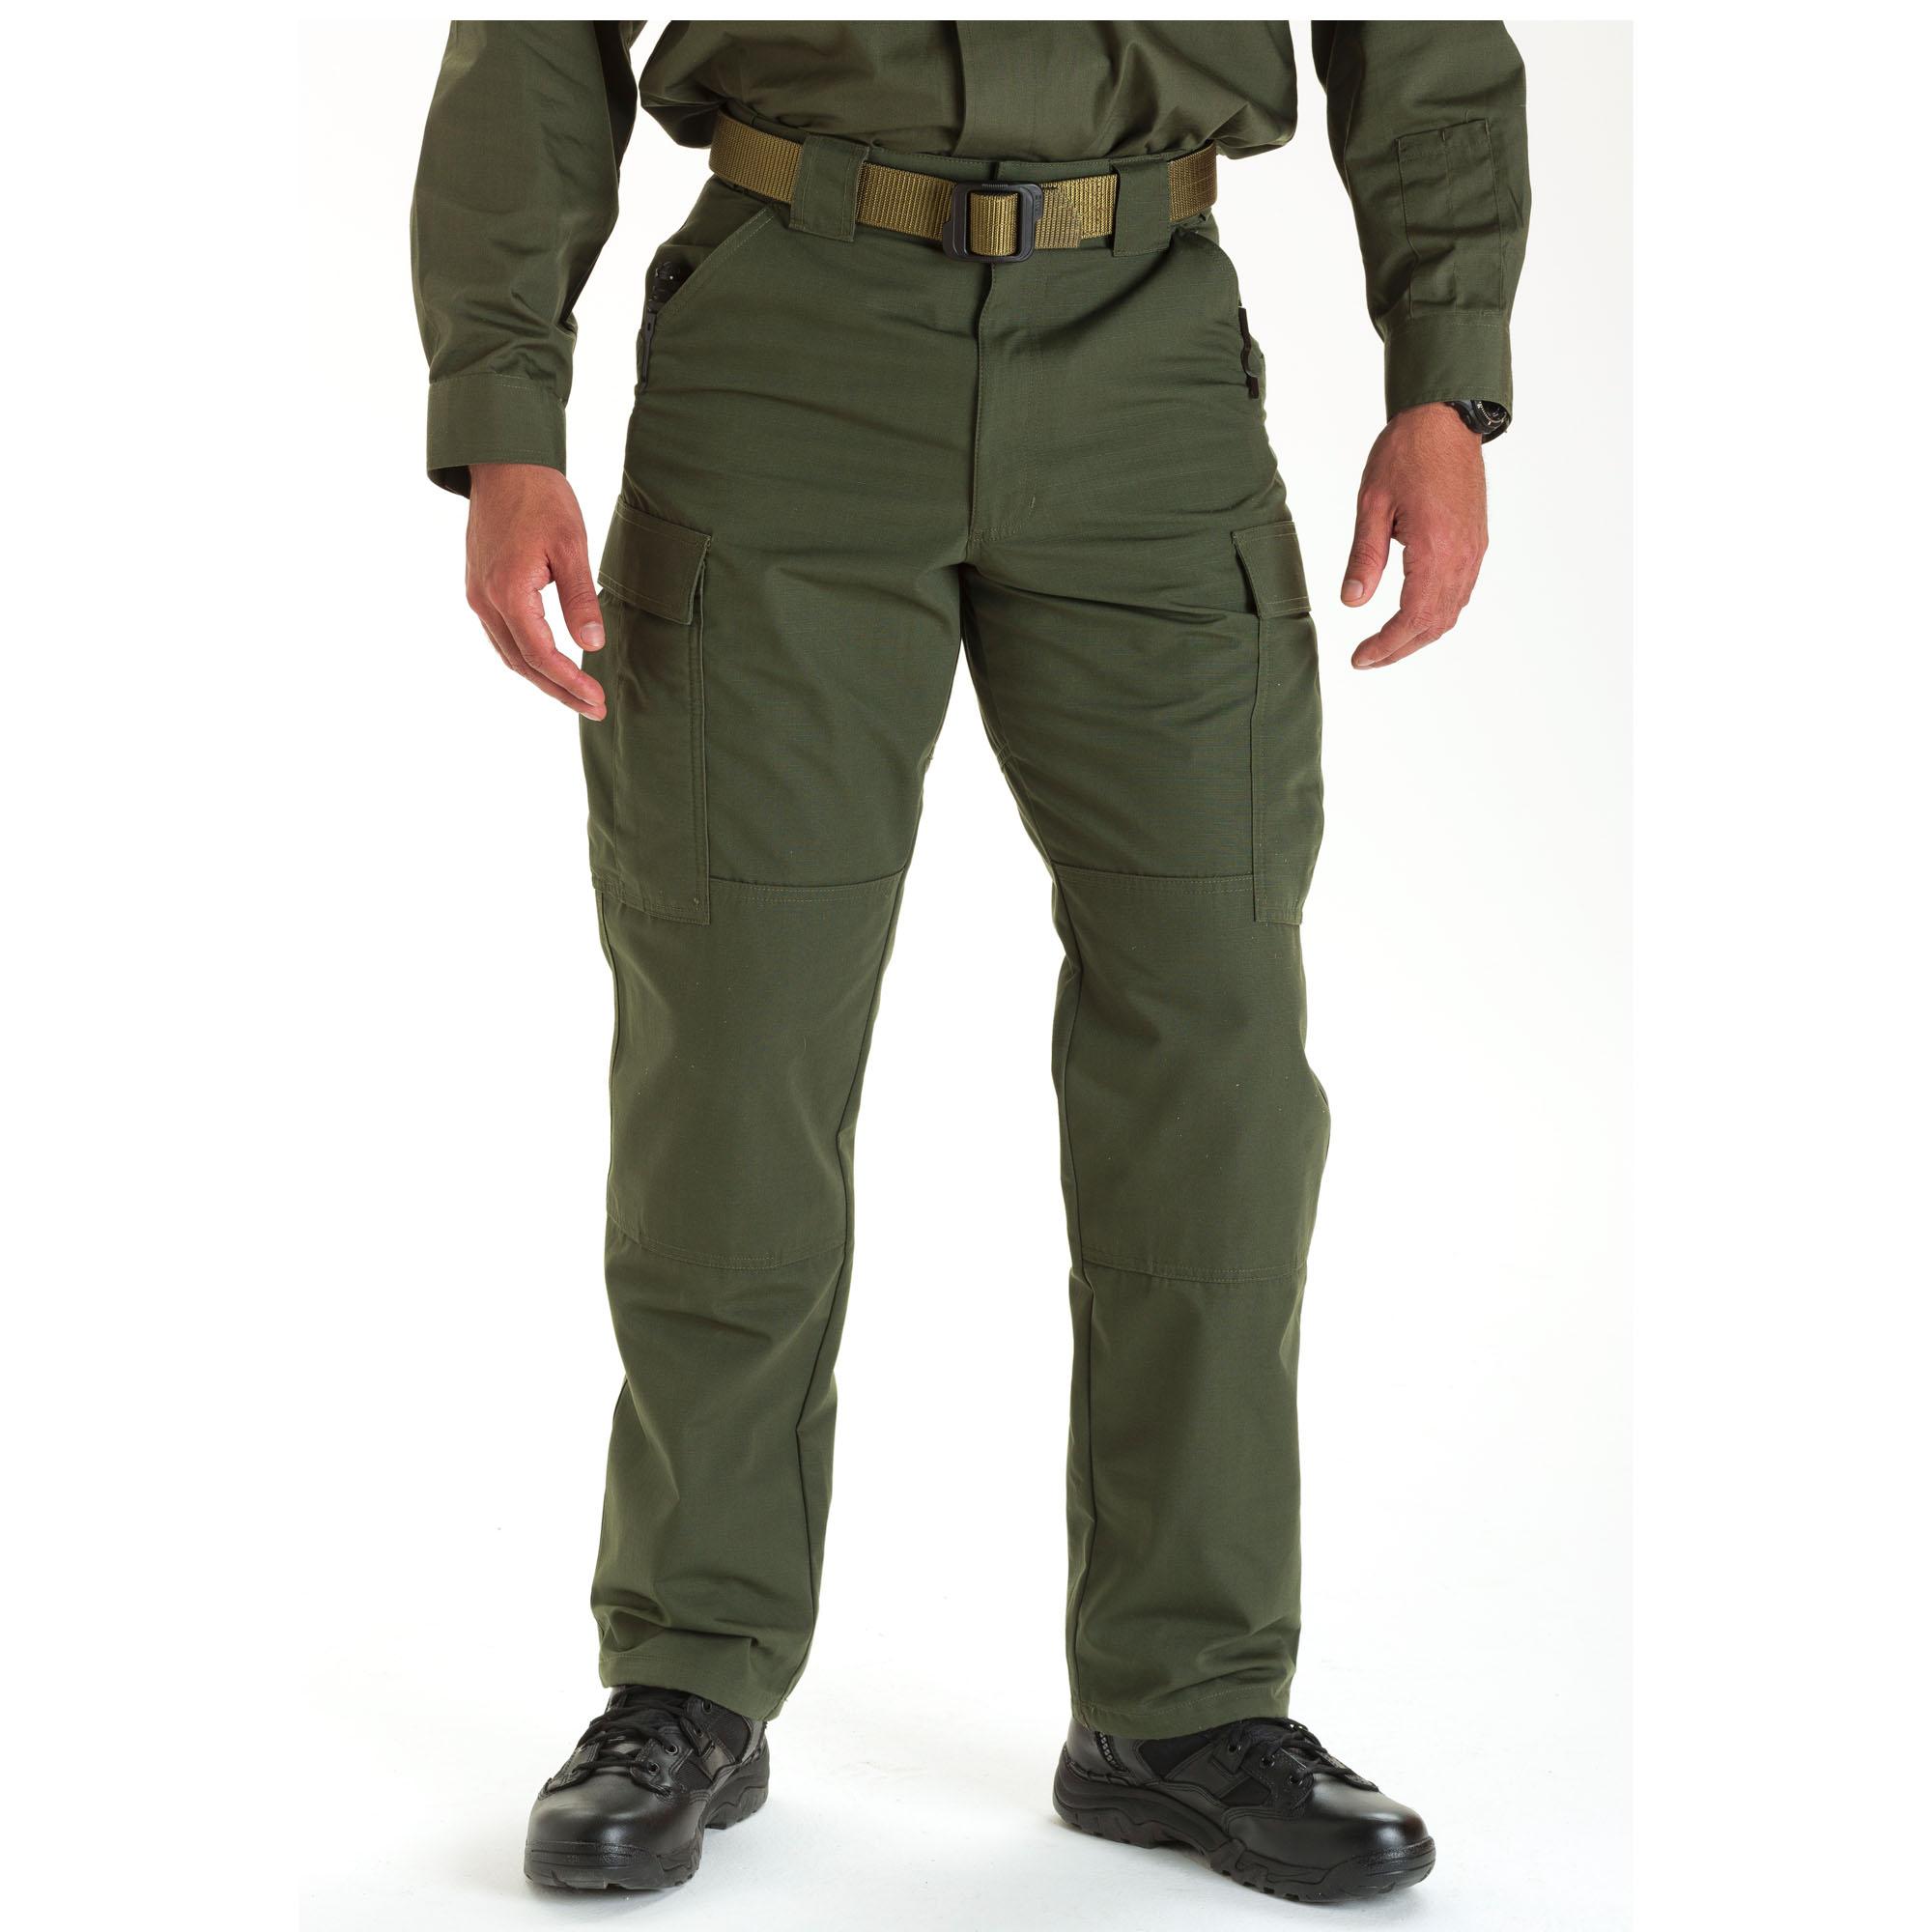 TDU Pants - Ripstop